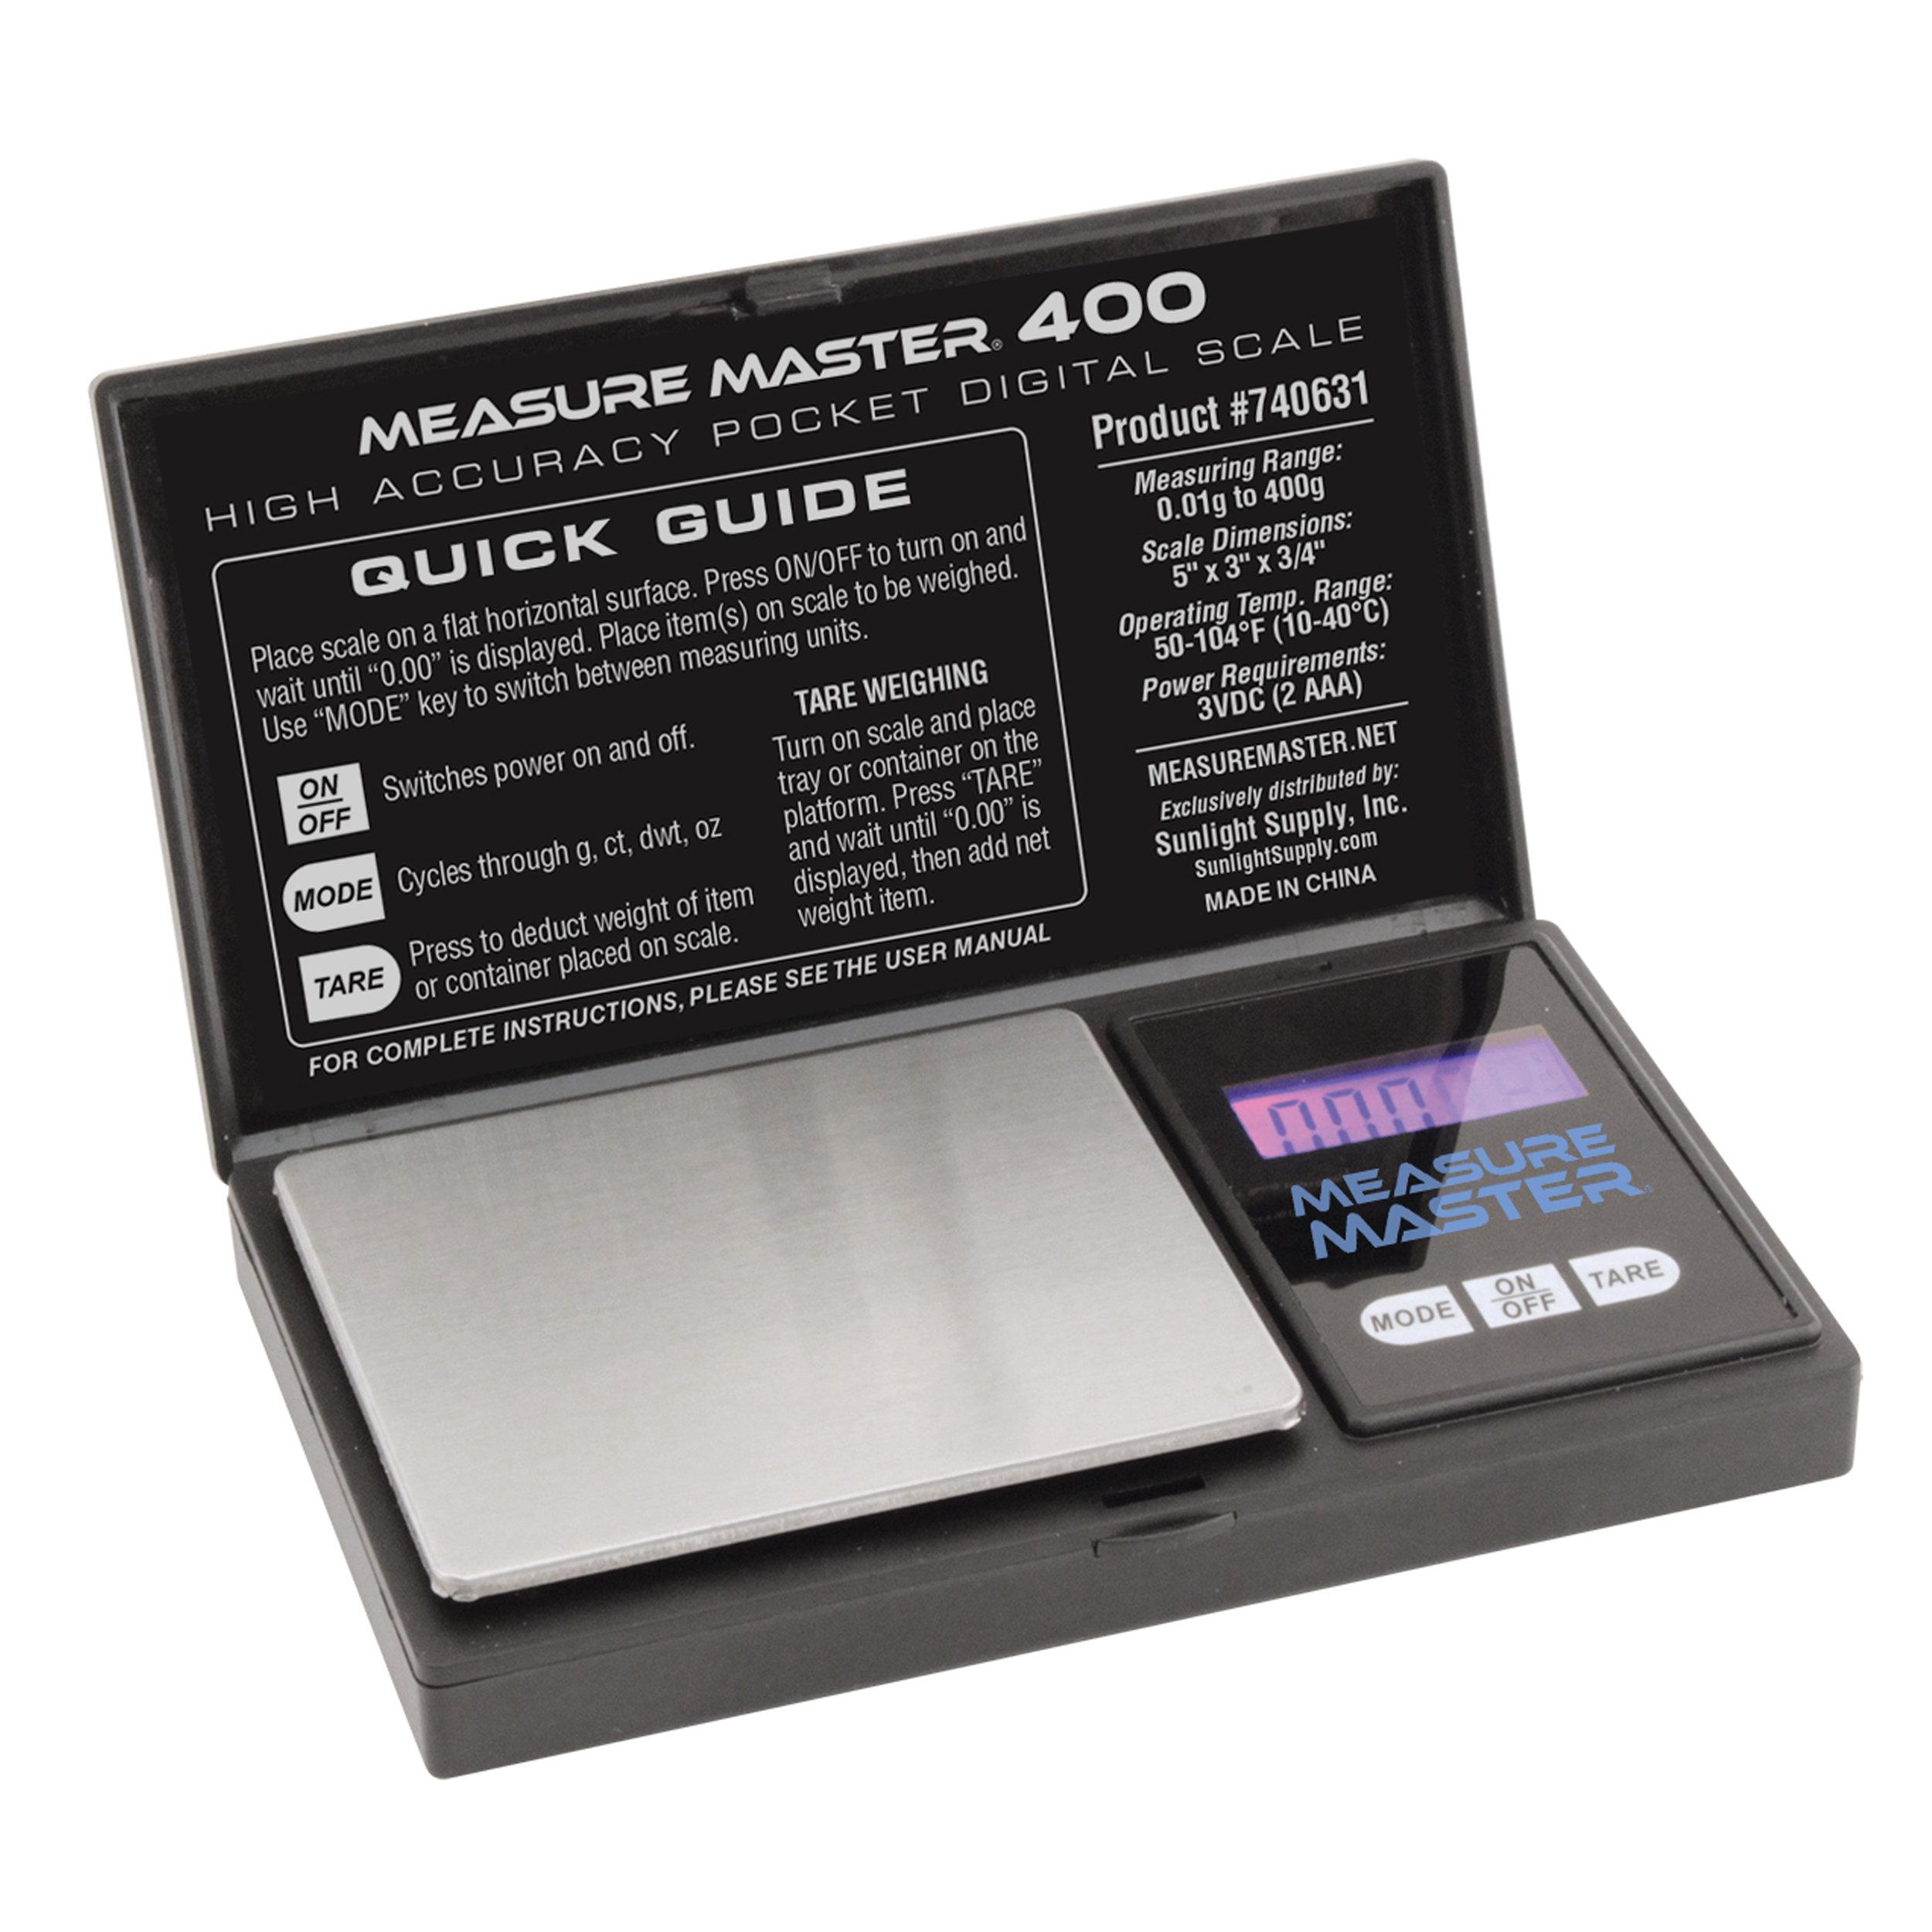 Liquid and Weight Measurement